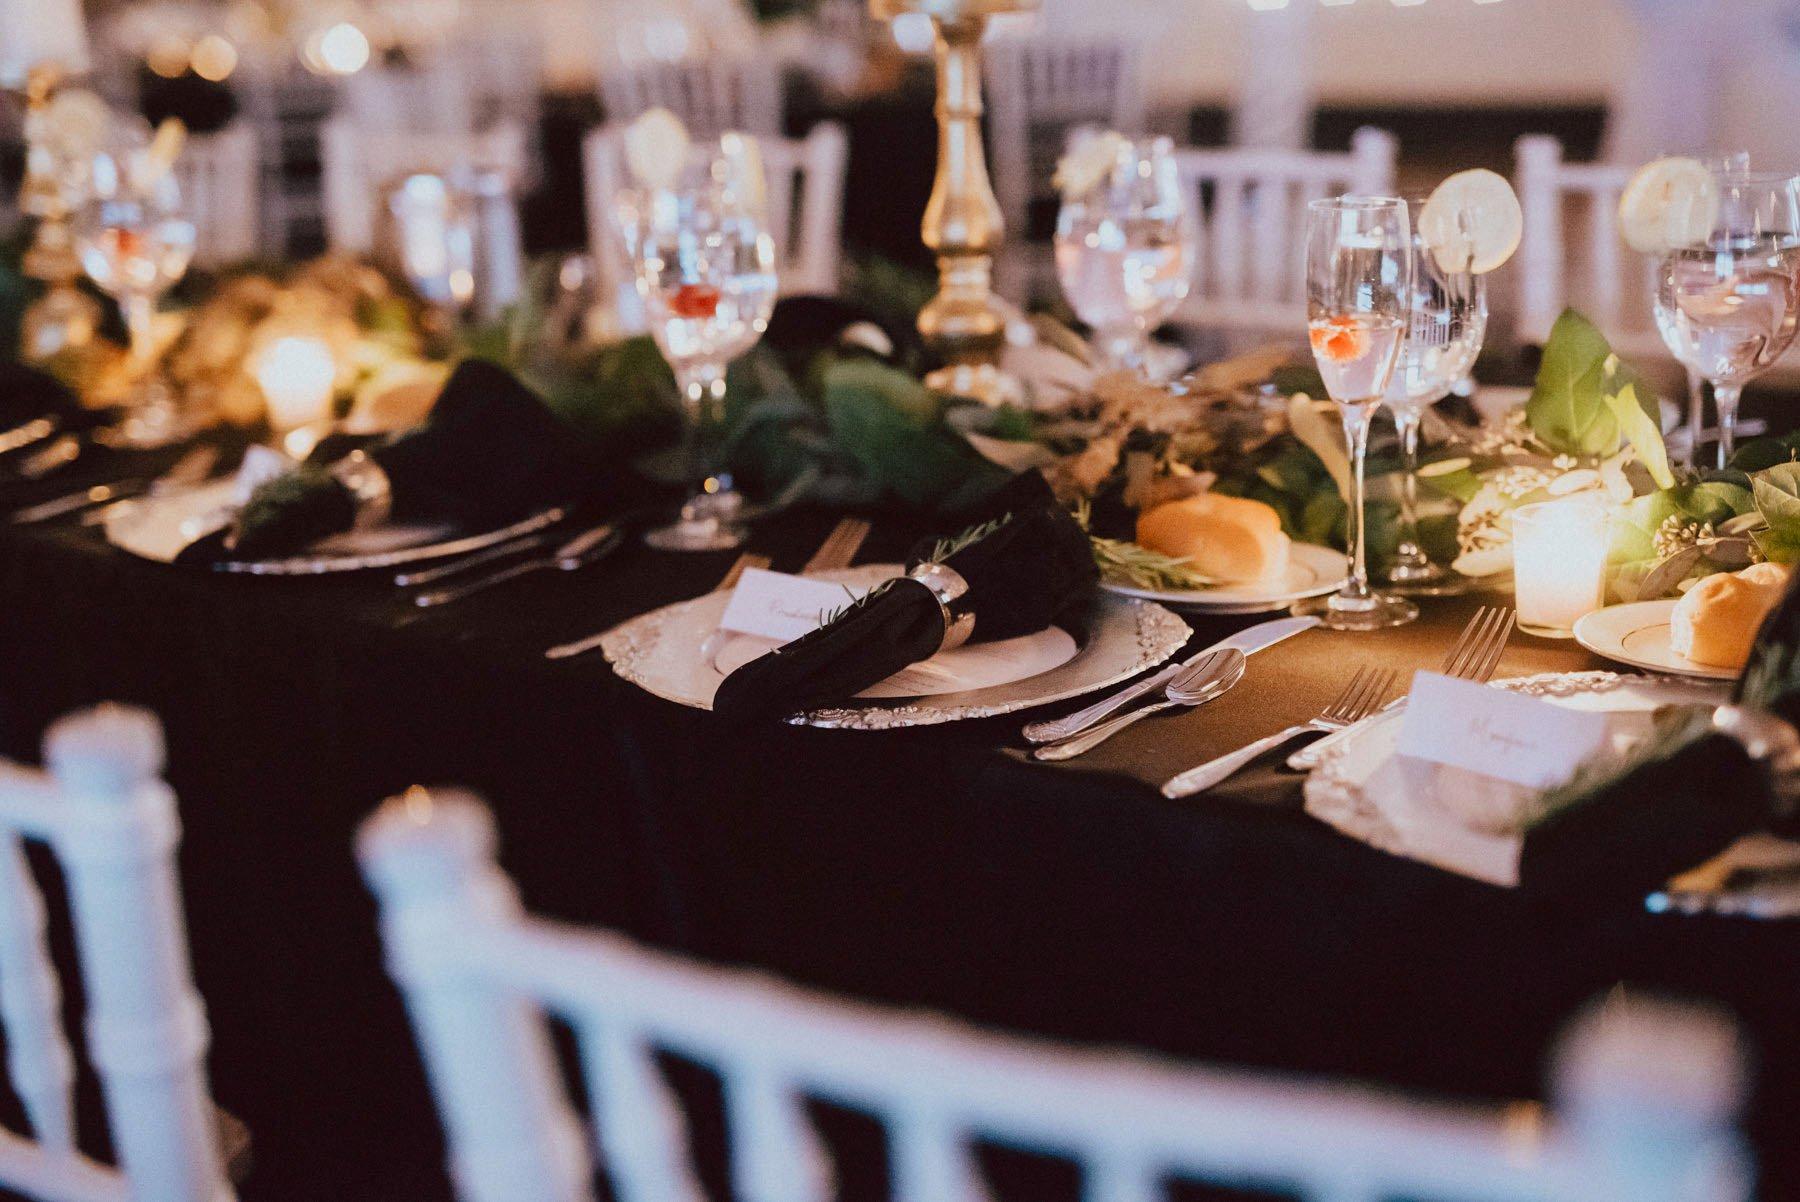 vie-philadelphia-indian-wedding-101.jpg